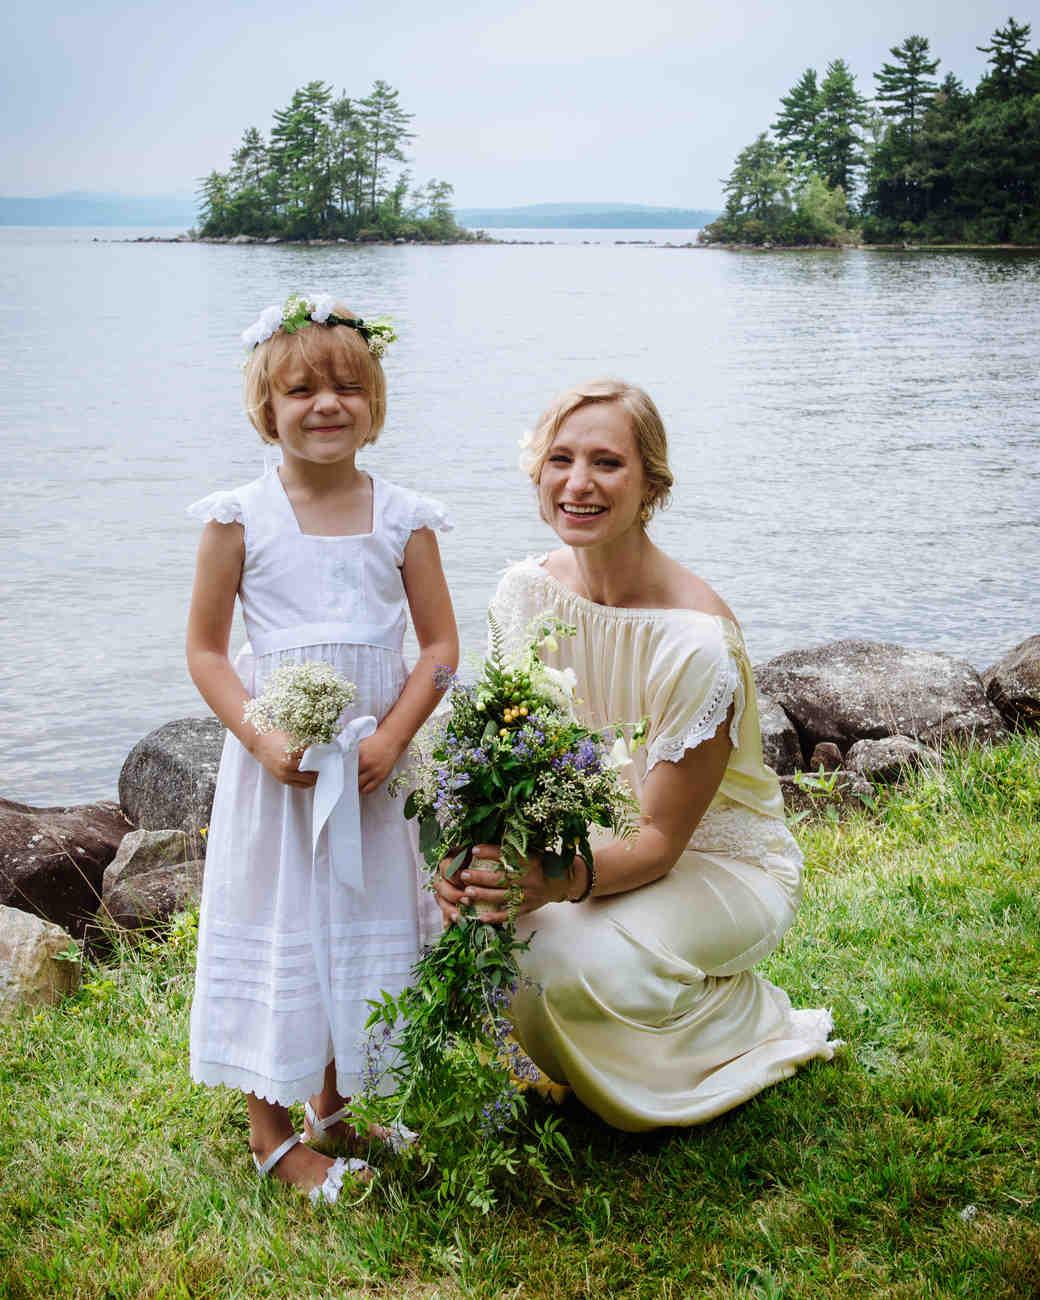 teresa-pepin-wedding-flower-girl-417-wds111105-0514.jpg